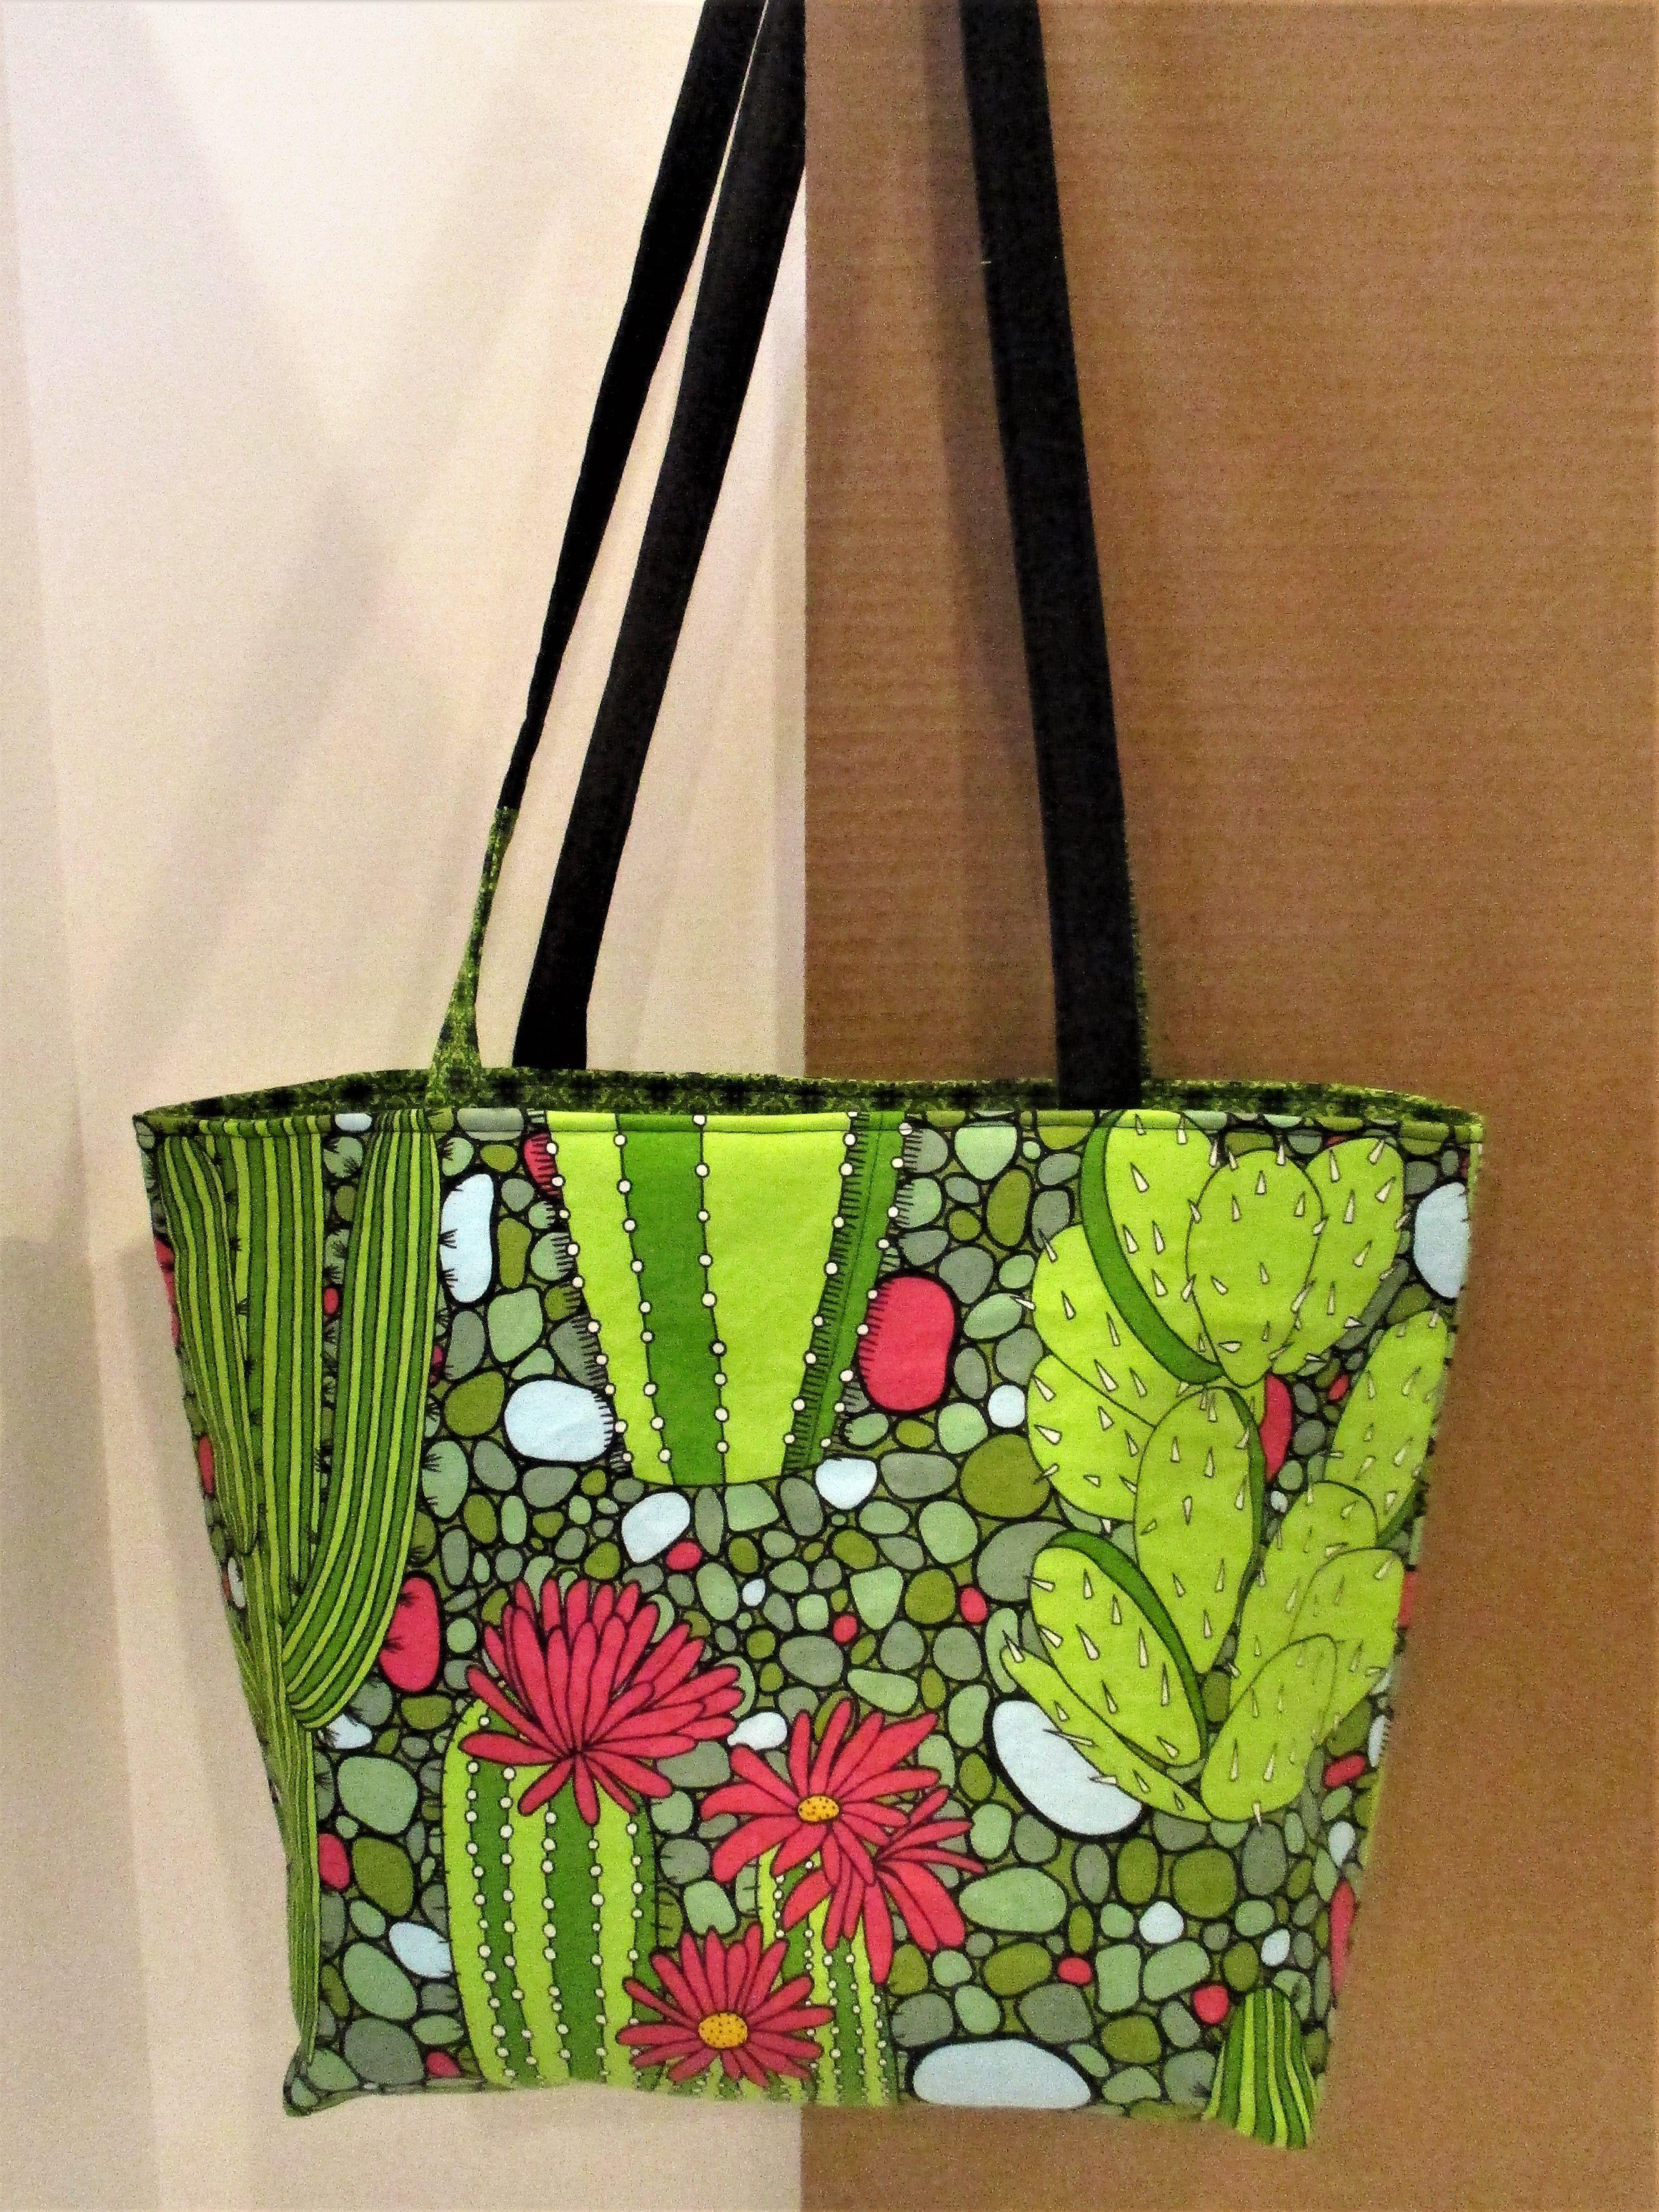 4ddb2f693d81 Handmade Tote Bag with Pocket, Cactus Cotton Fabric Handbag, Travel ...